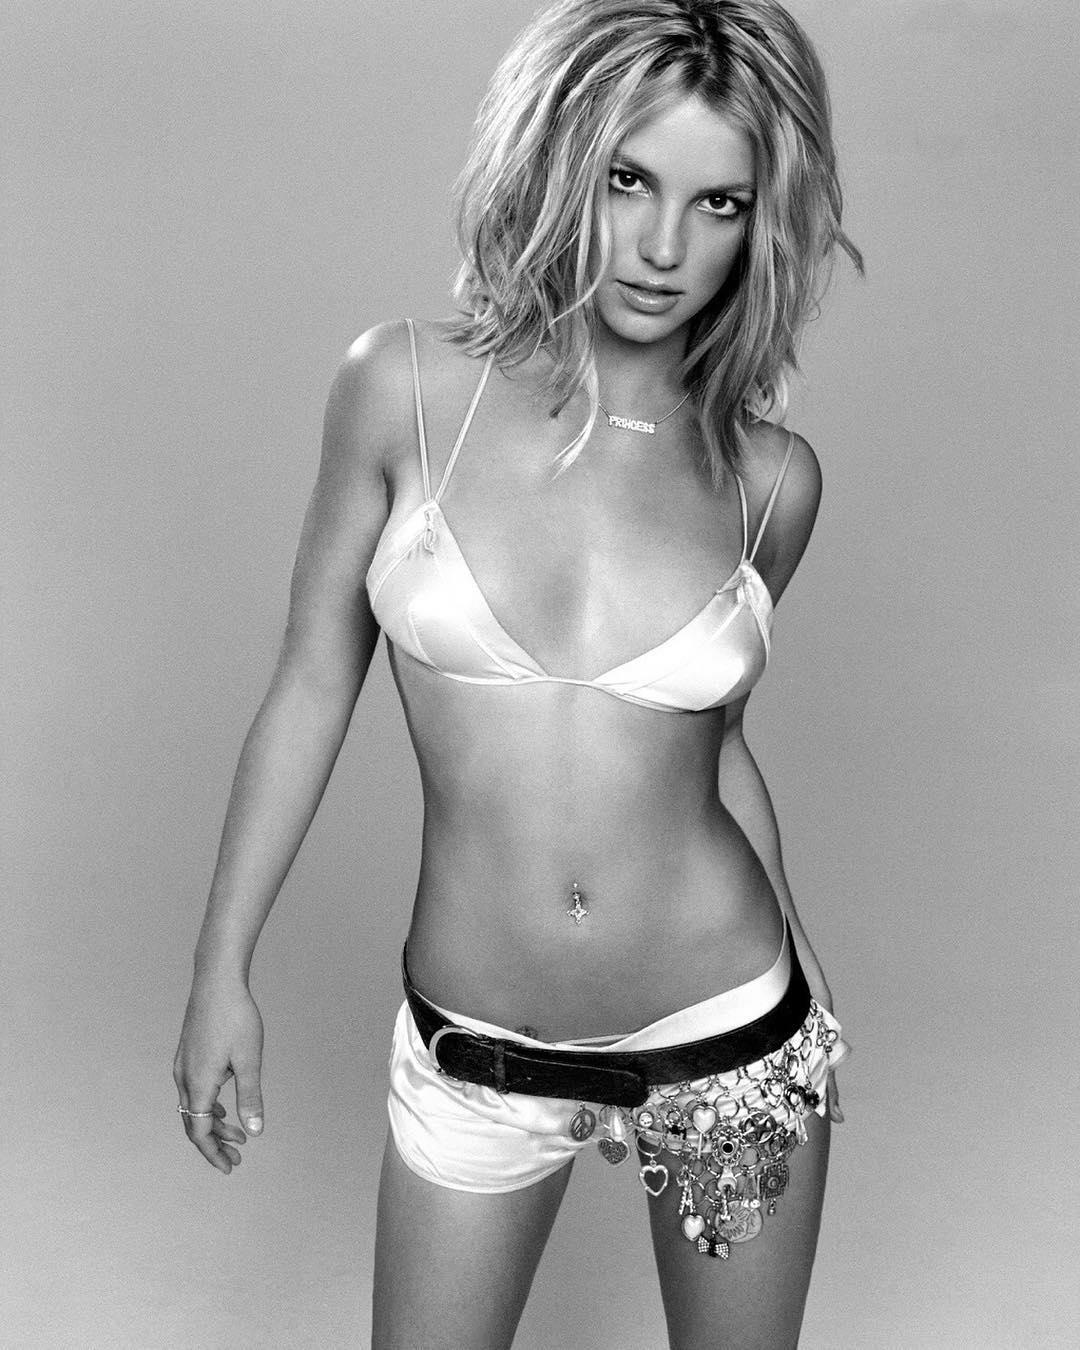 Britney Spears pode reformar-se aos 37 anos